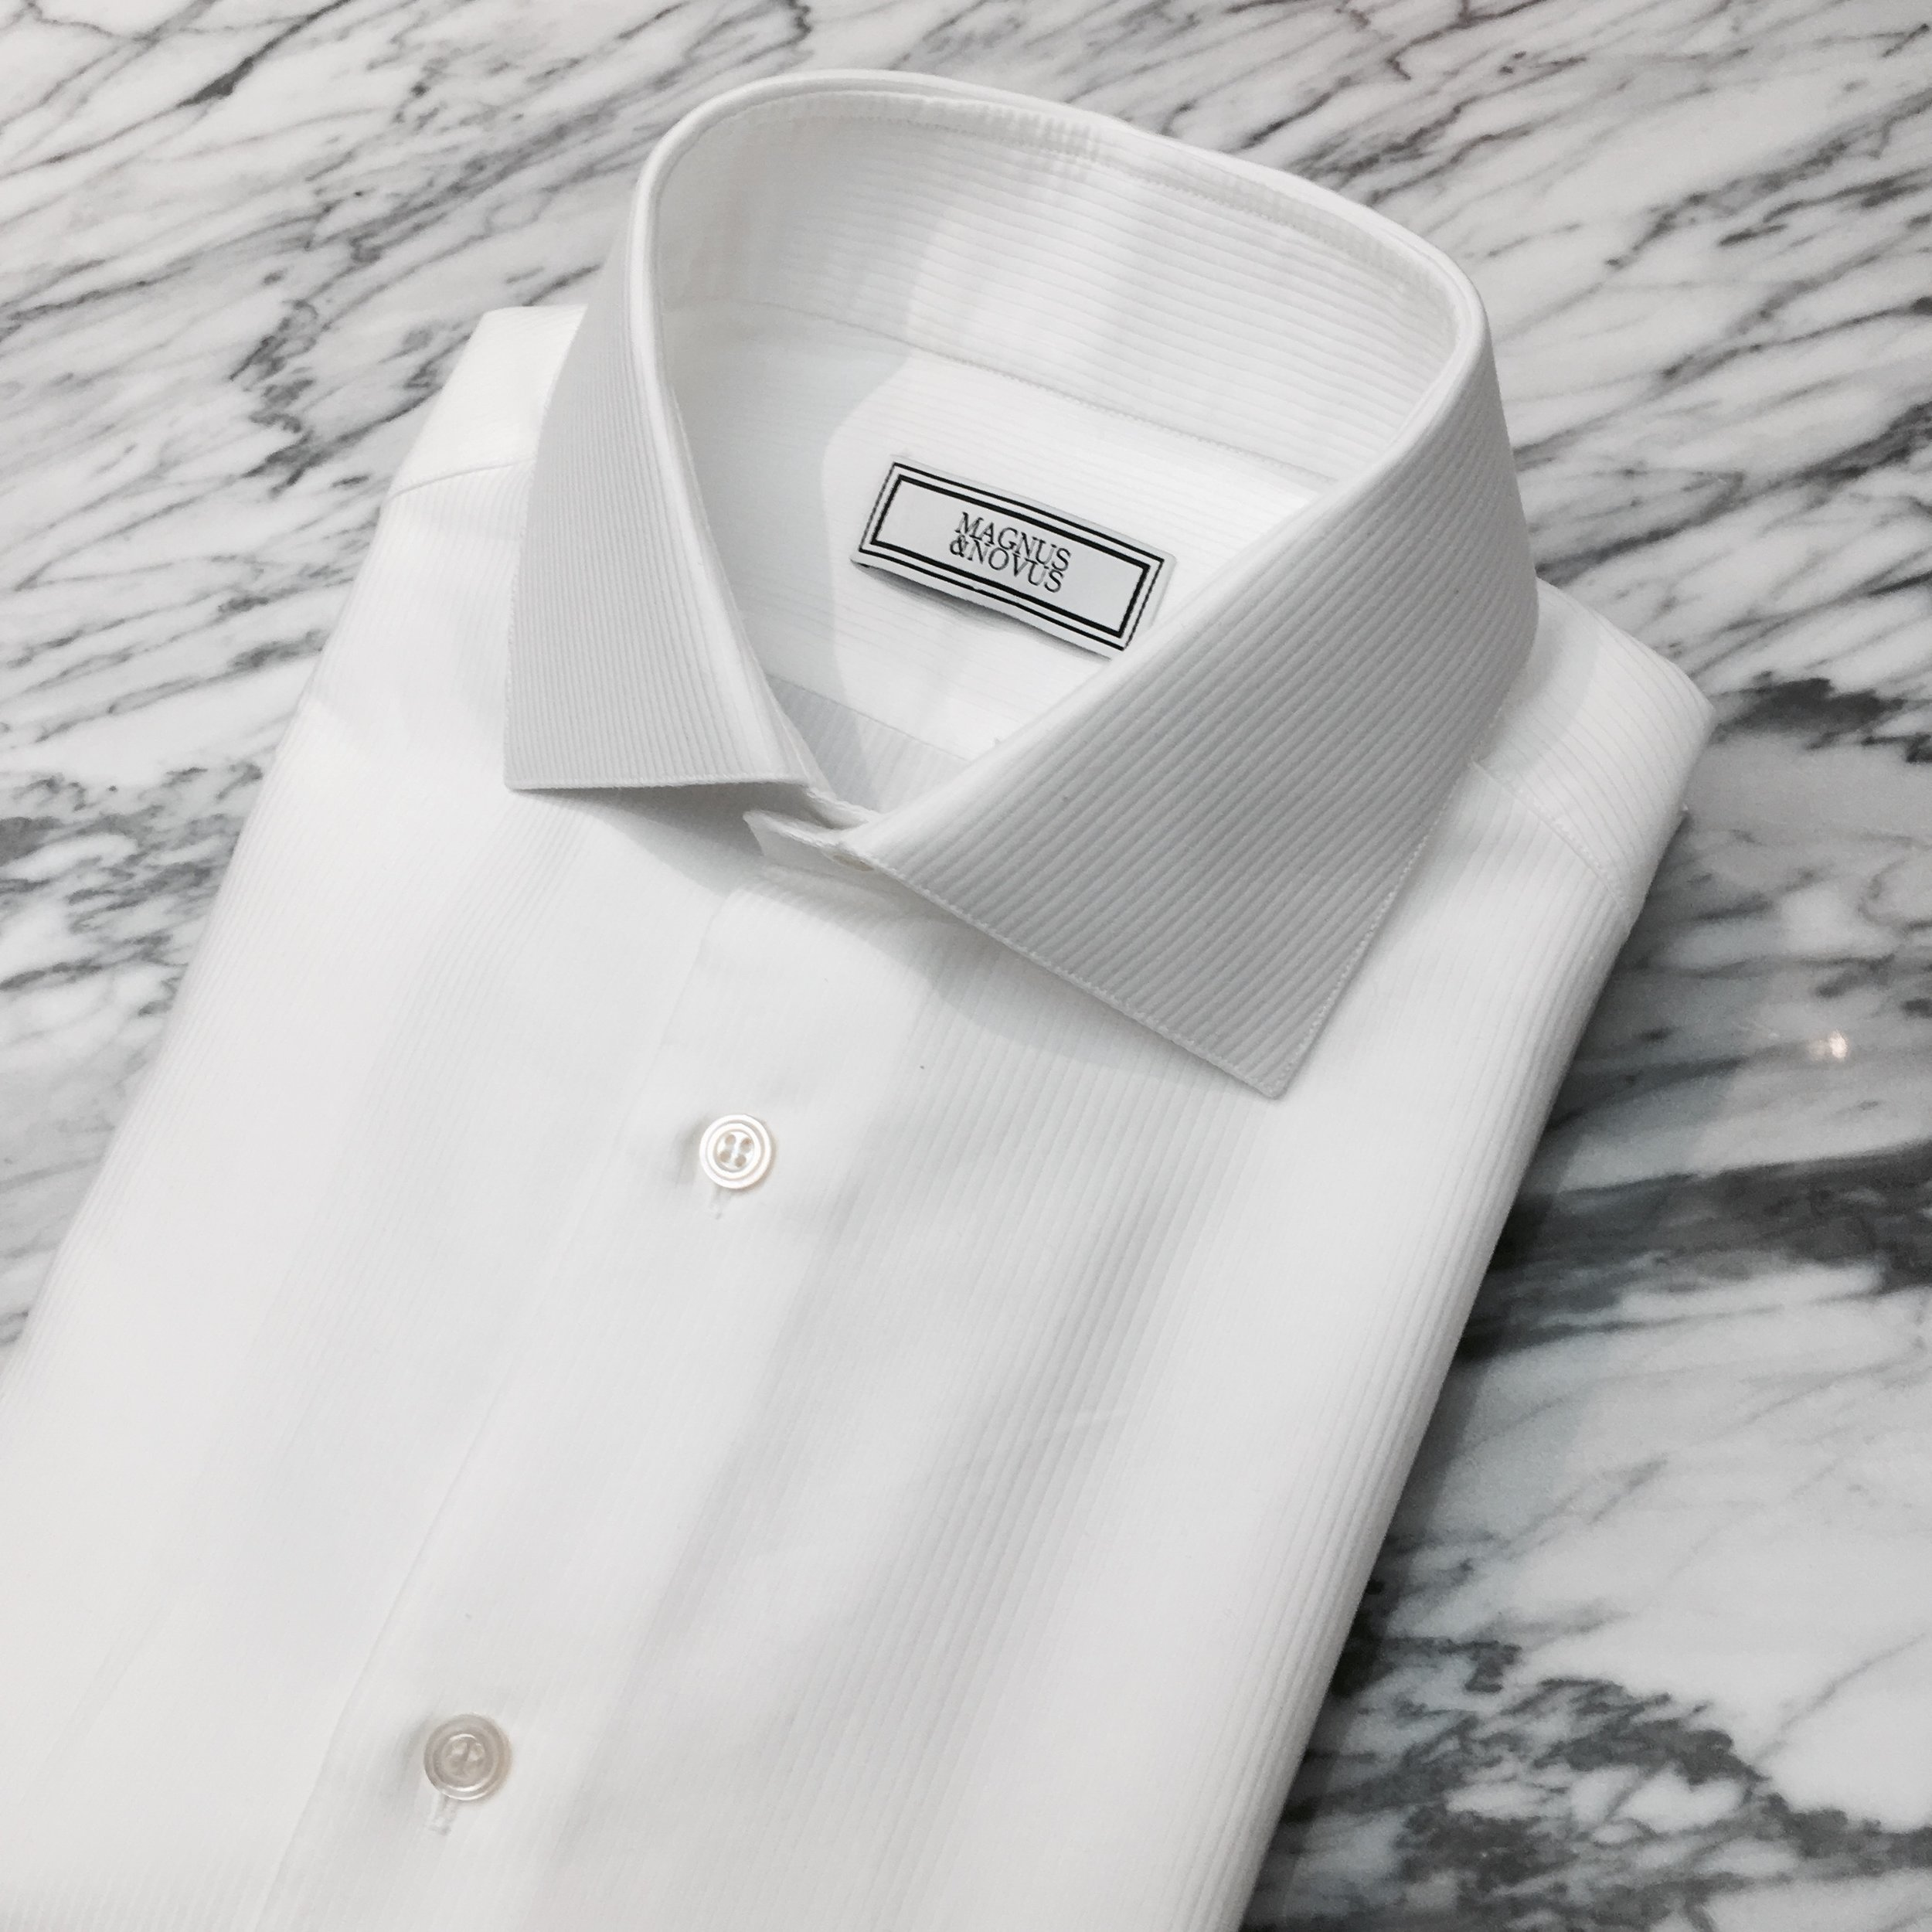 Magnus & Novus x Alumo - Bespoke Dress Shirt